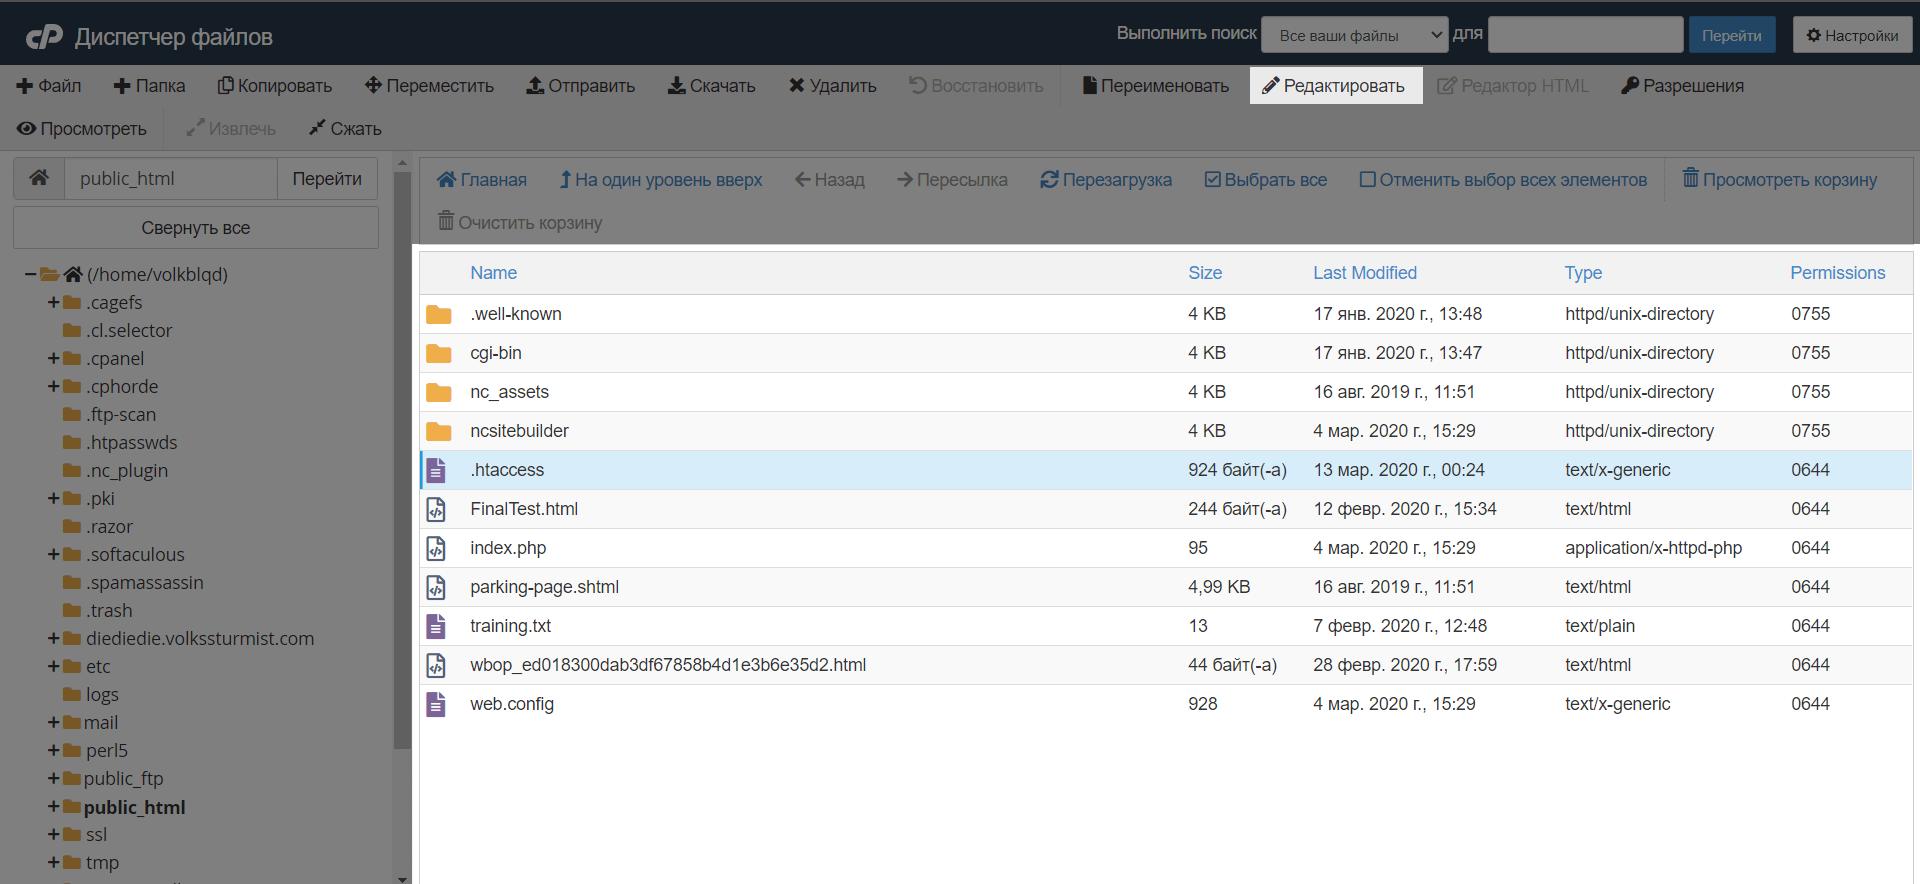 WordPress SSL-сертификат. Файл .htaccess в корневой папке домена.